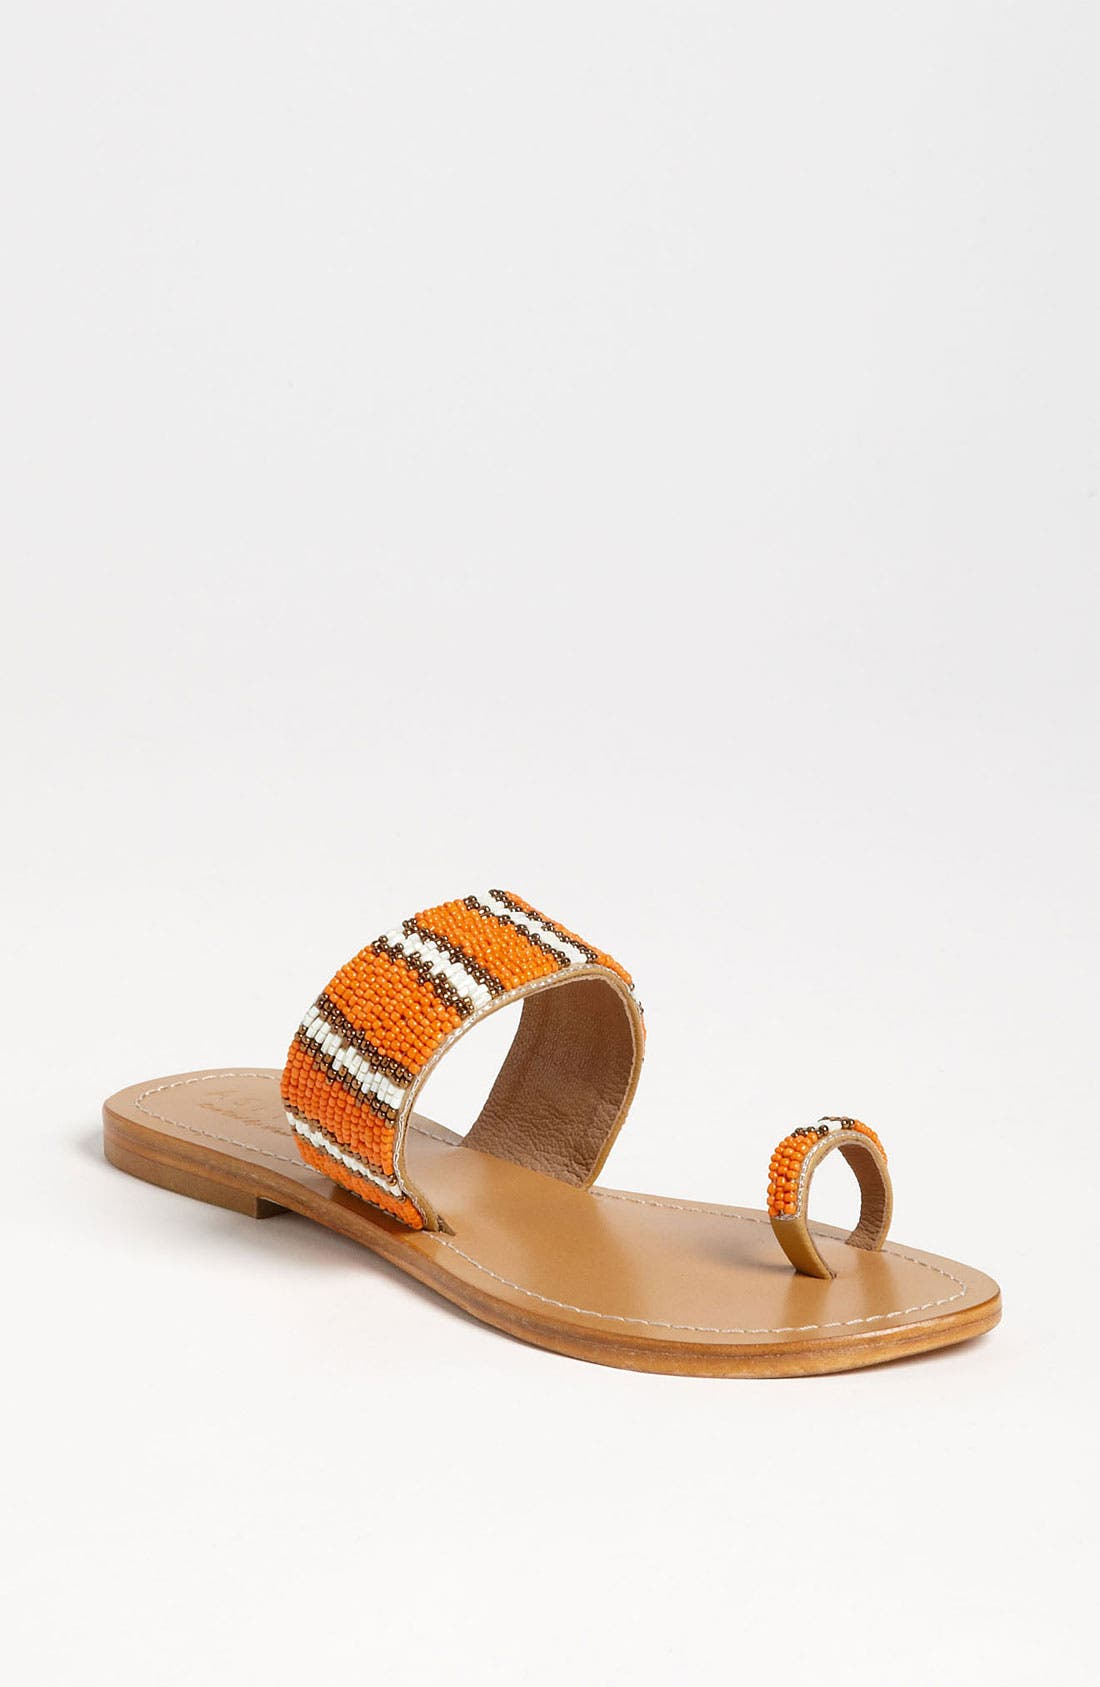 Main Image - Aspiga 'Omana' Sandal